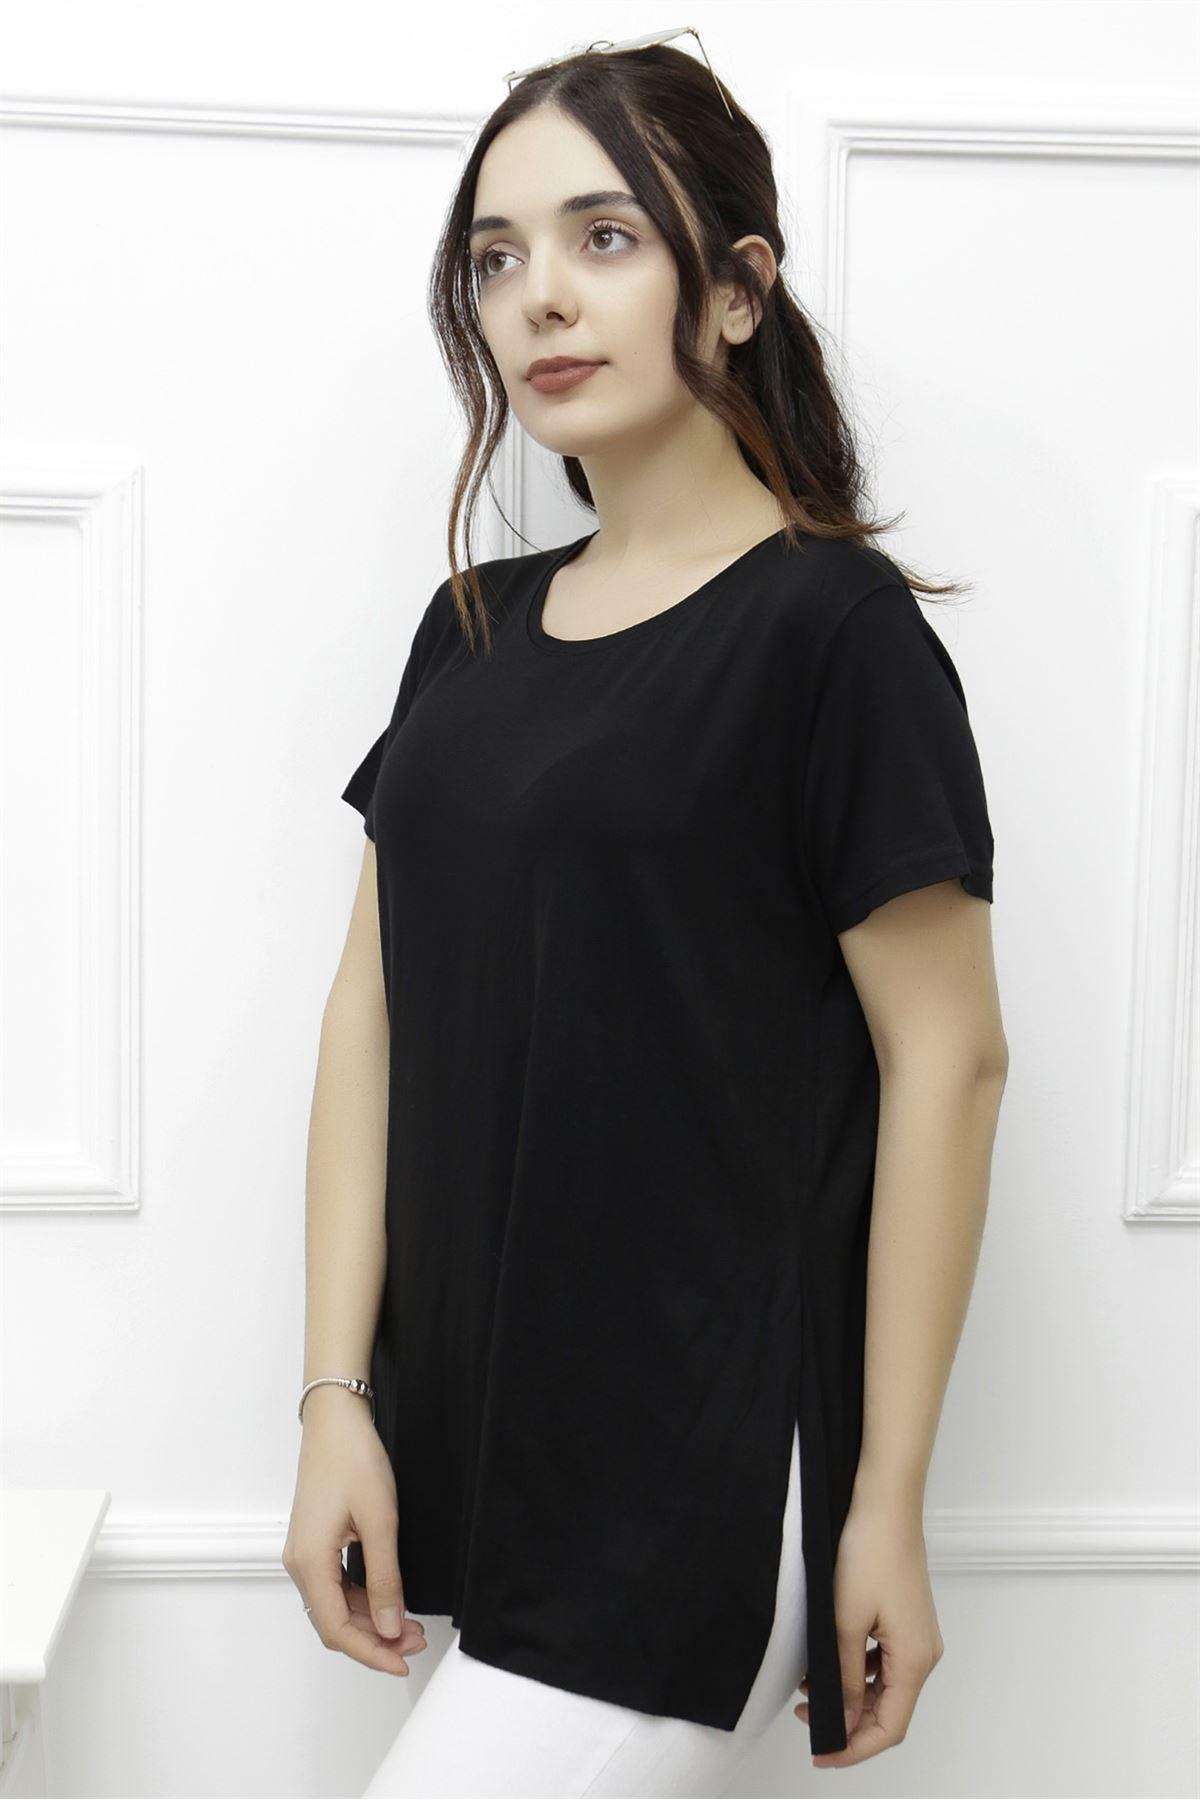 Kadın Yan Yırtmaçlı Viskon Tişört Siyah - 1174.1095.